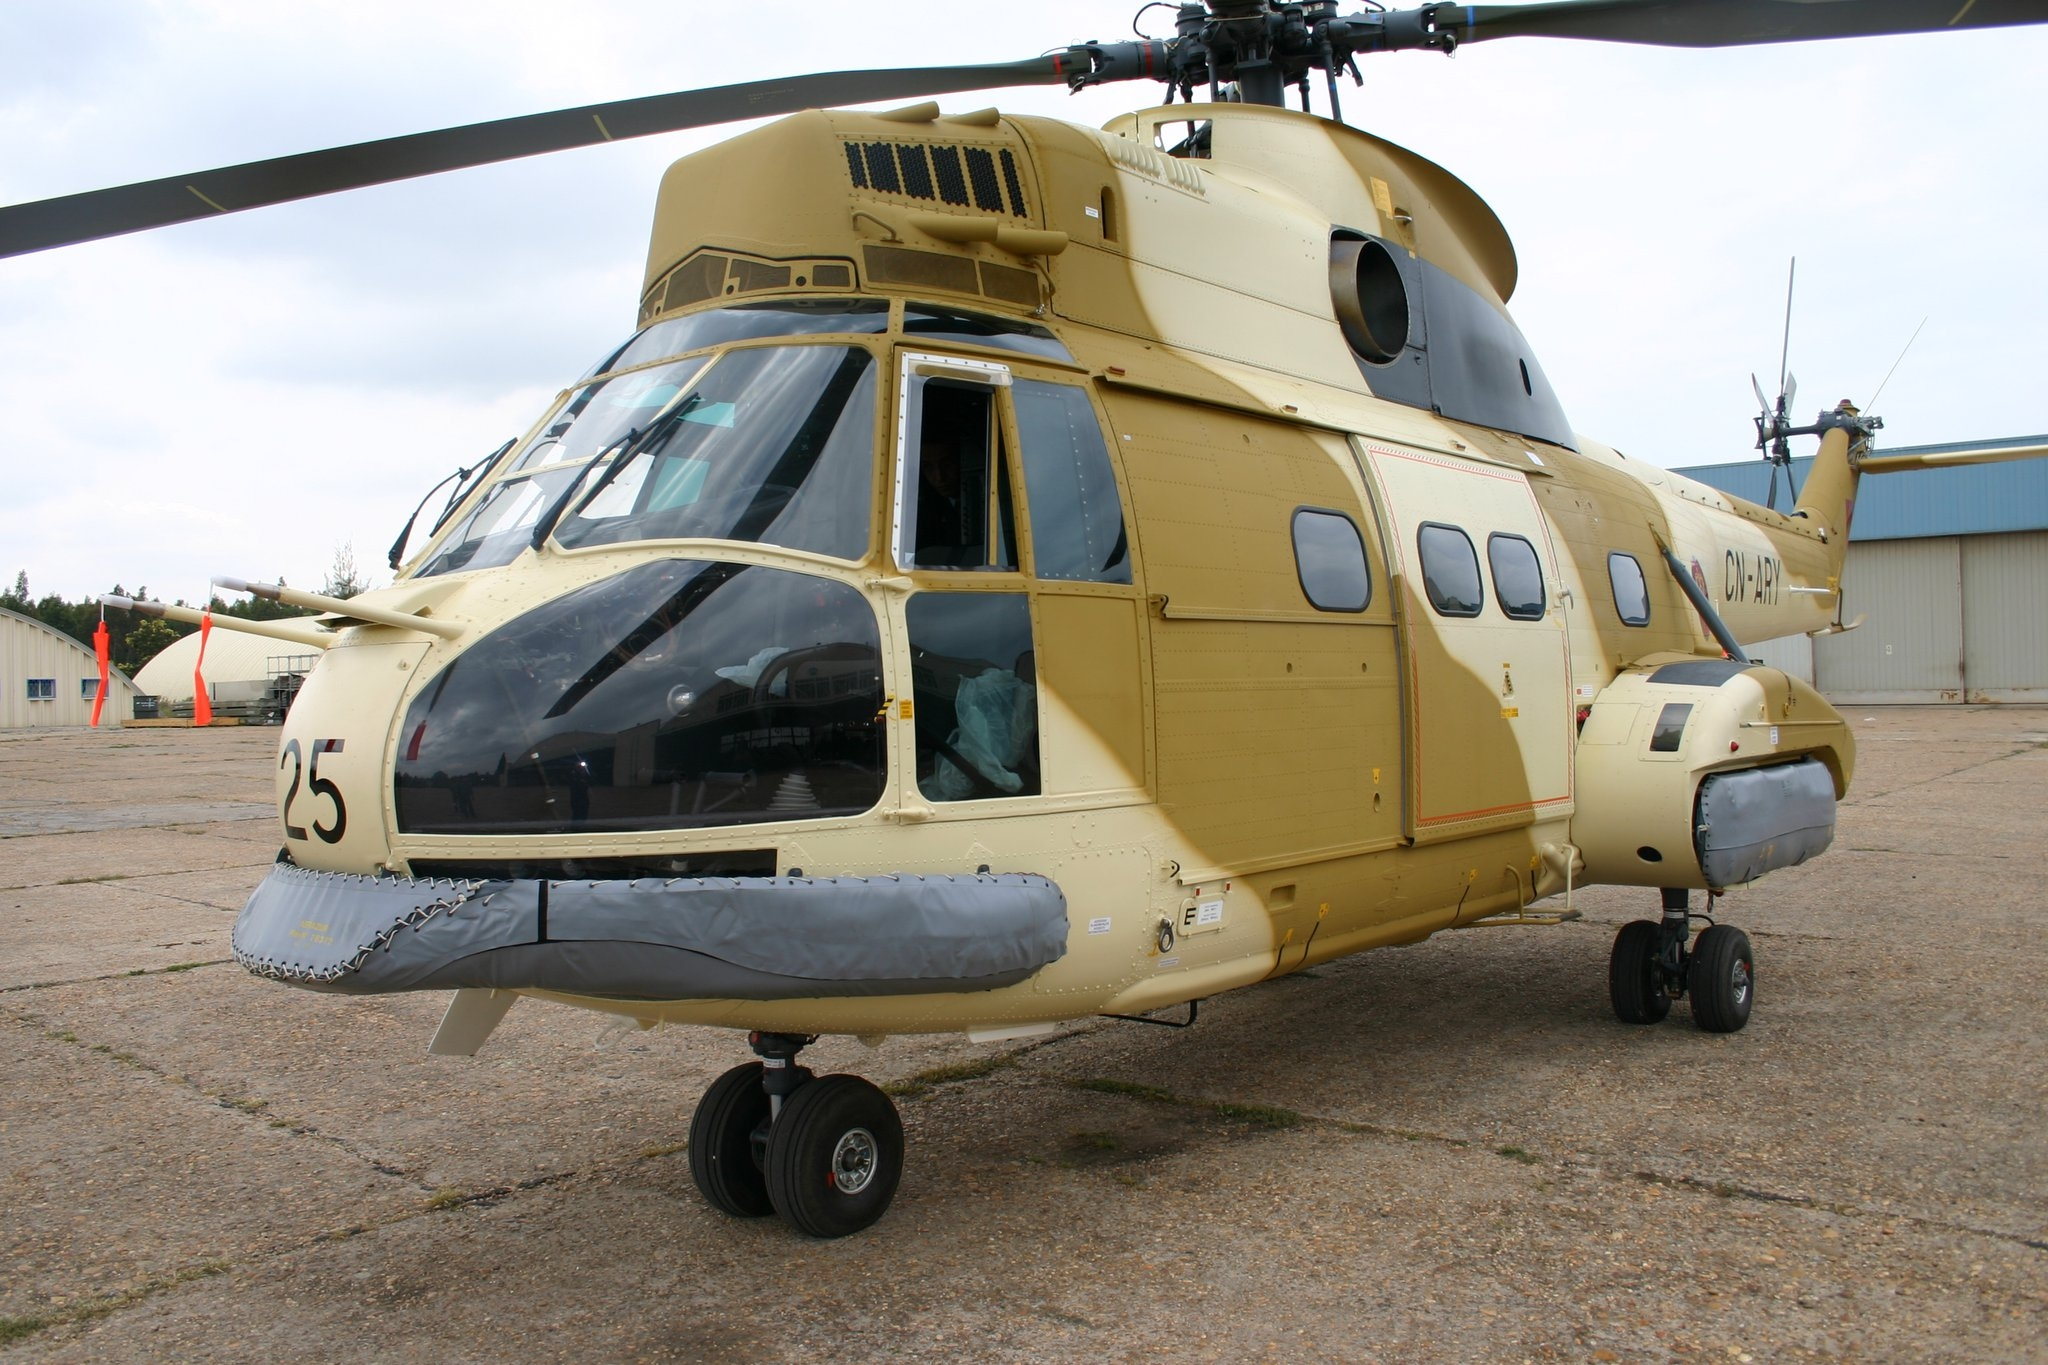 FRA: Photos d'hélicoptères - Page 17 50760900172_495032c44c_o_d